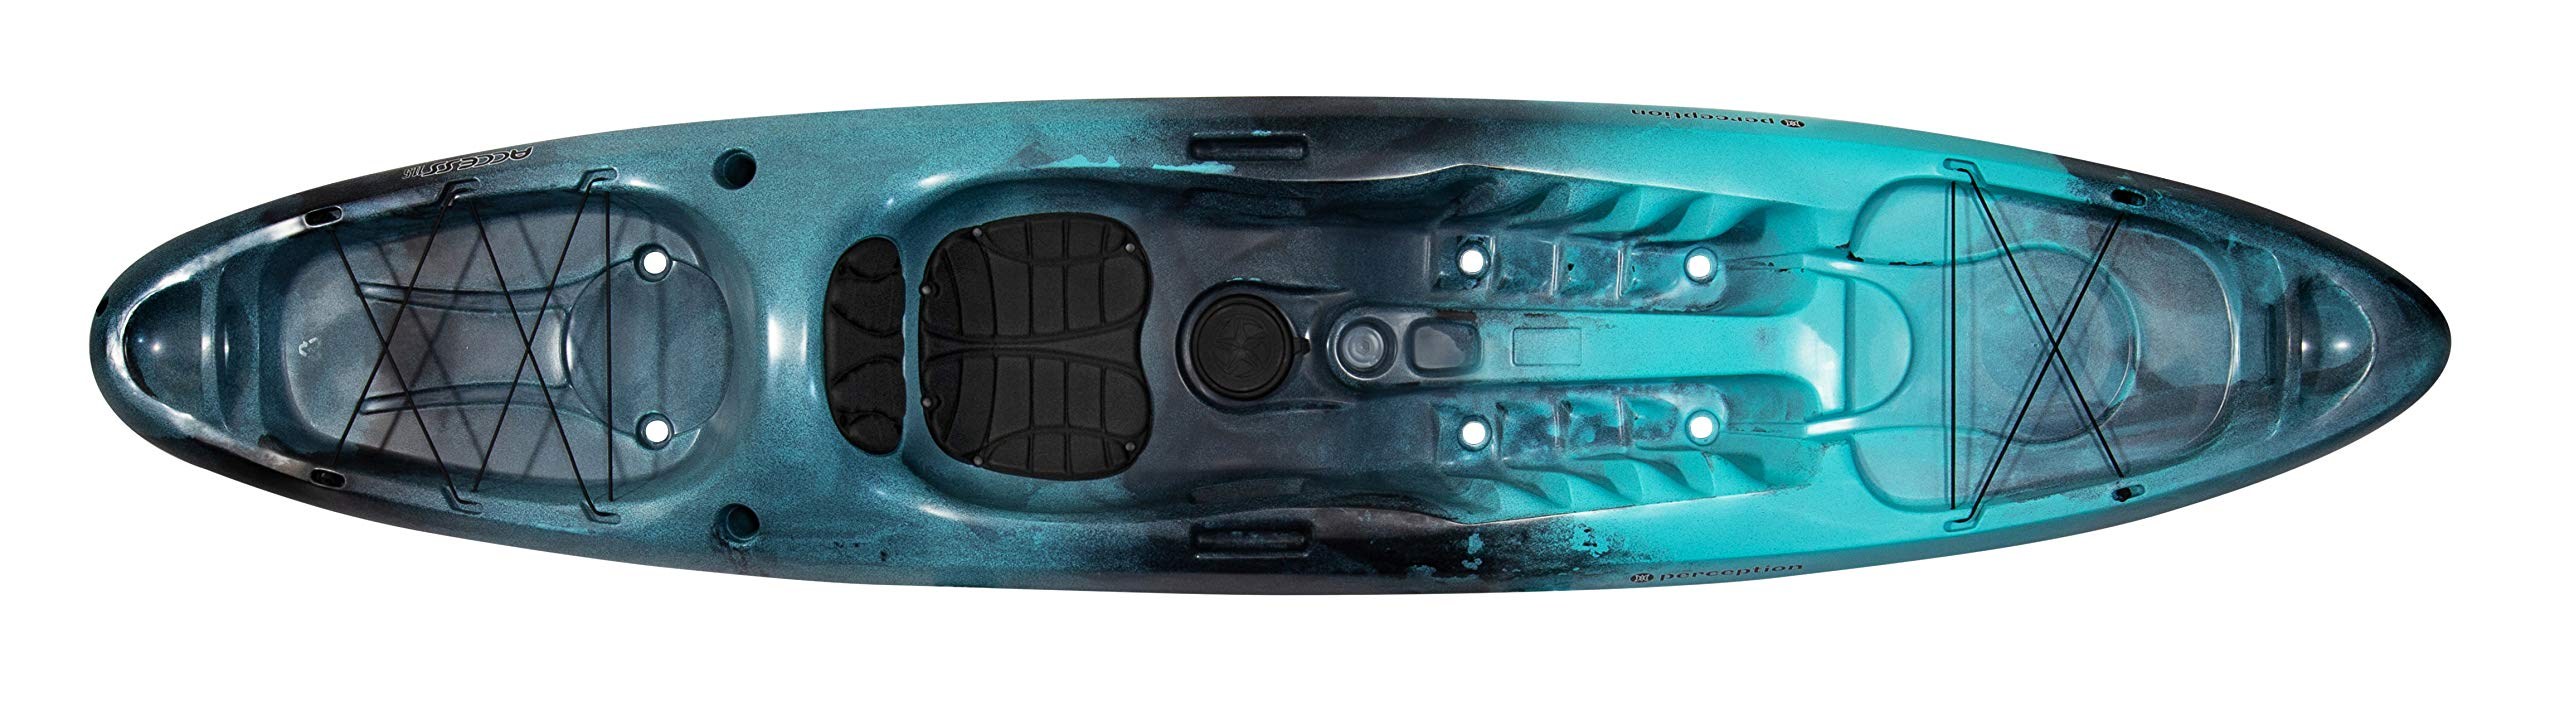 Perception Access | Sit on Top Kayak for Adults | Recreational Kayak | 11' 6'' | Dapper by Perception Kayaks